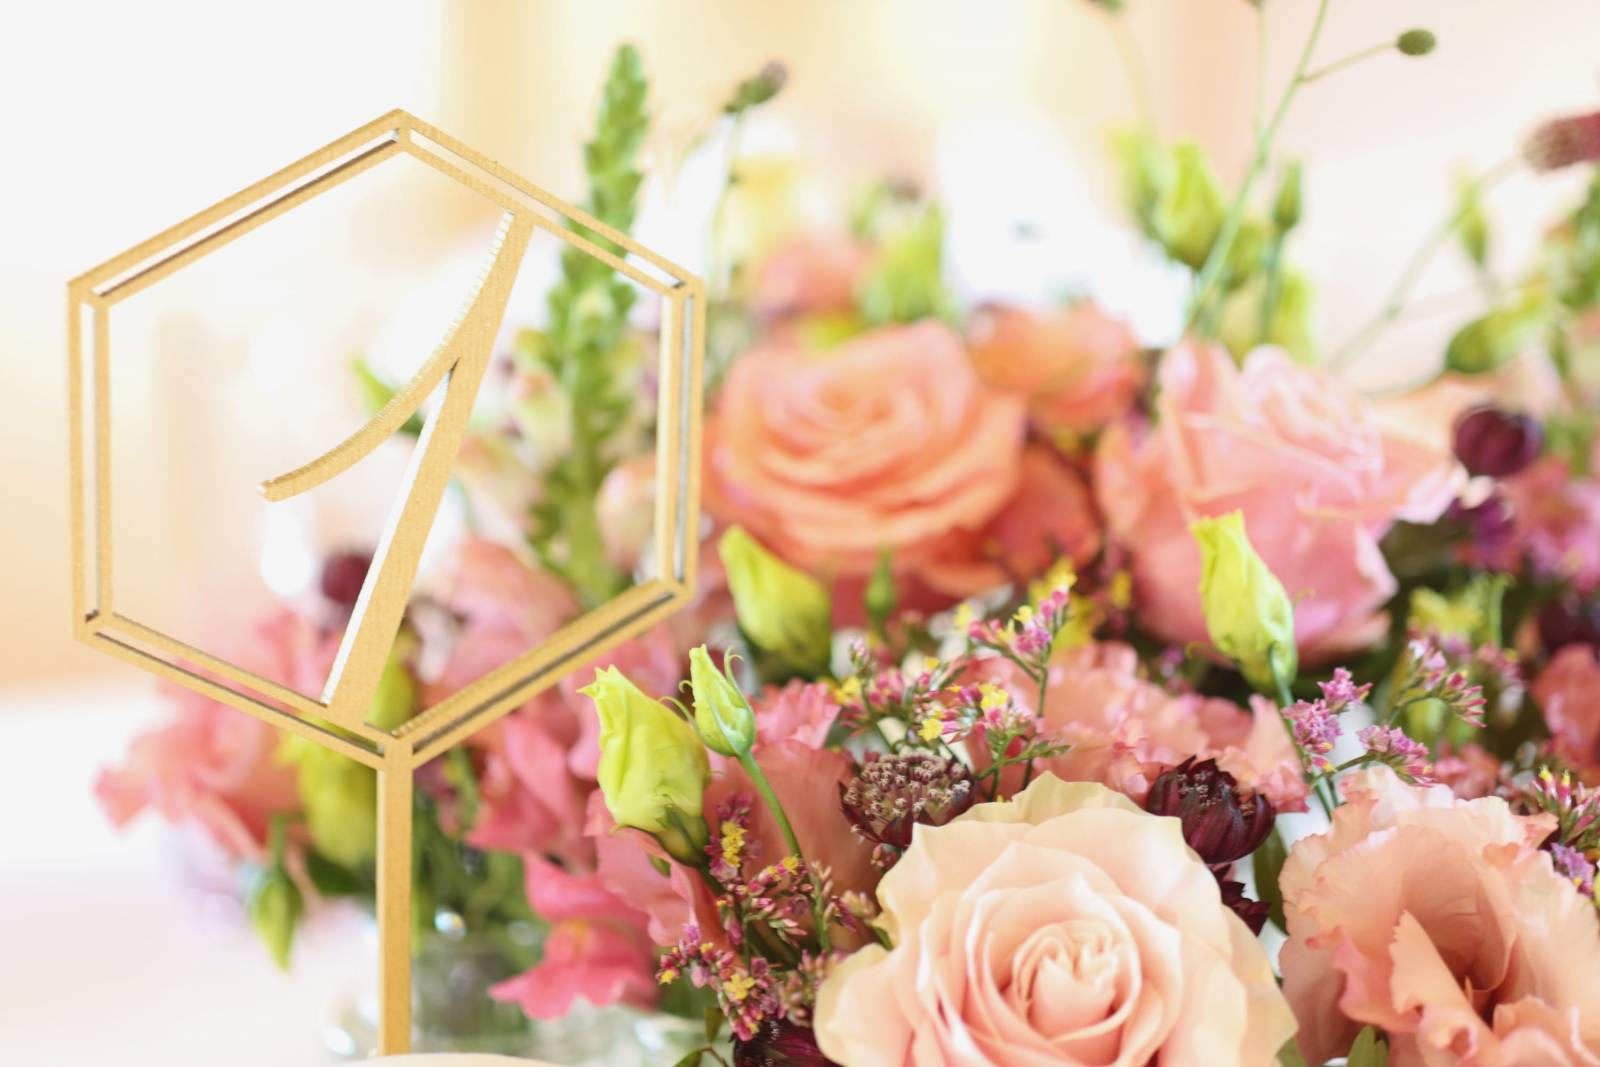 Maison Fleurie - Fotograaf zelfgetrokken - House of Weddings - 12